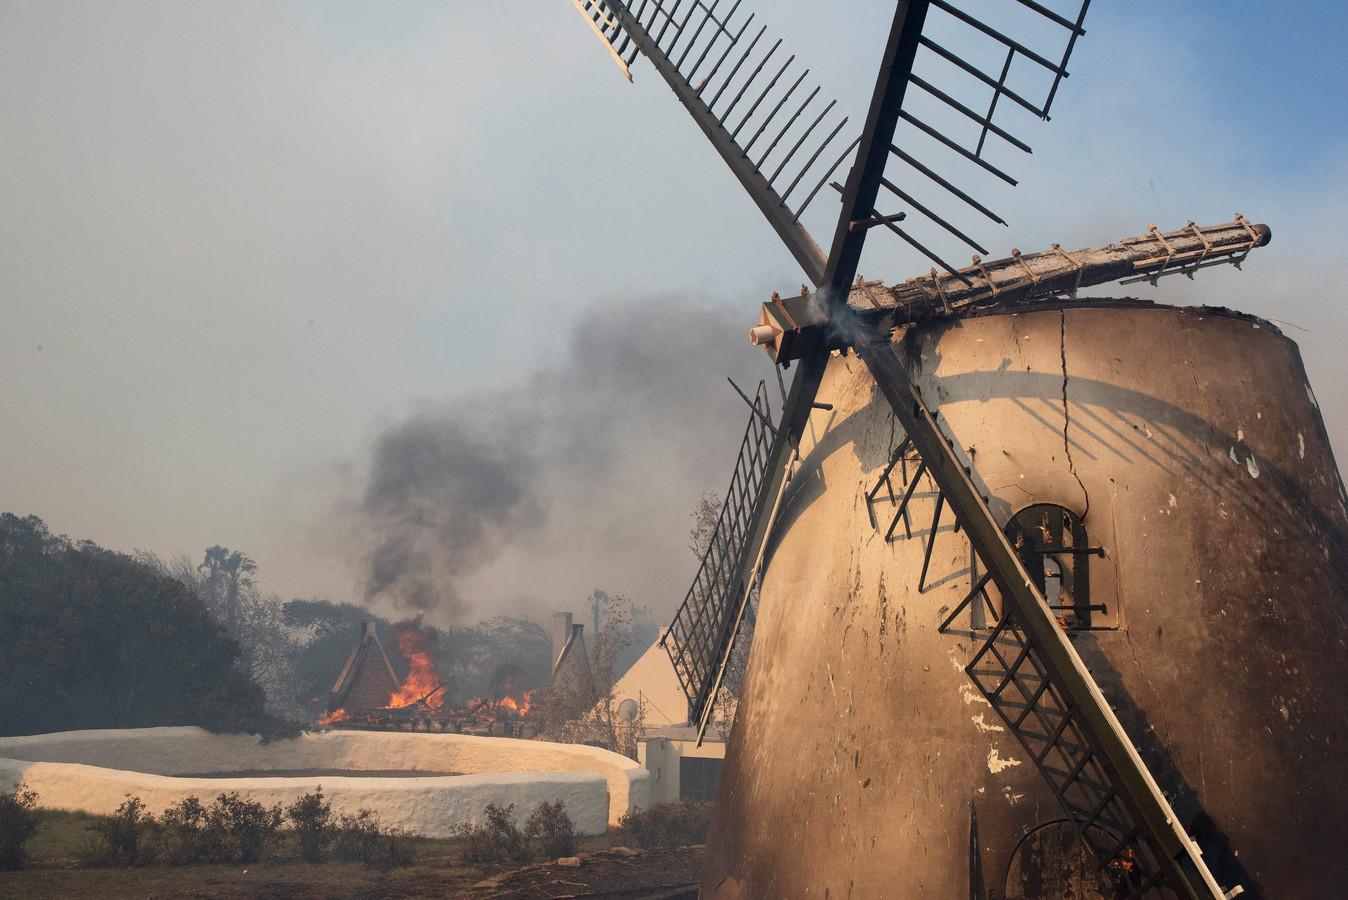 Ook de oudste windmolen van Zuid-Afrika, Mostert's Mill, die van 1796 dateerde, brandde helemaal af.